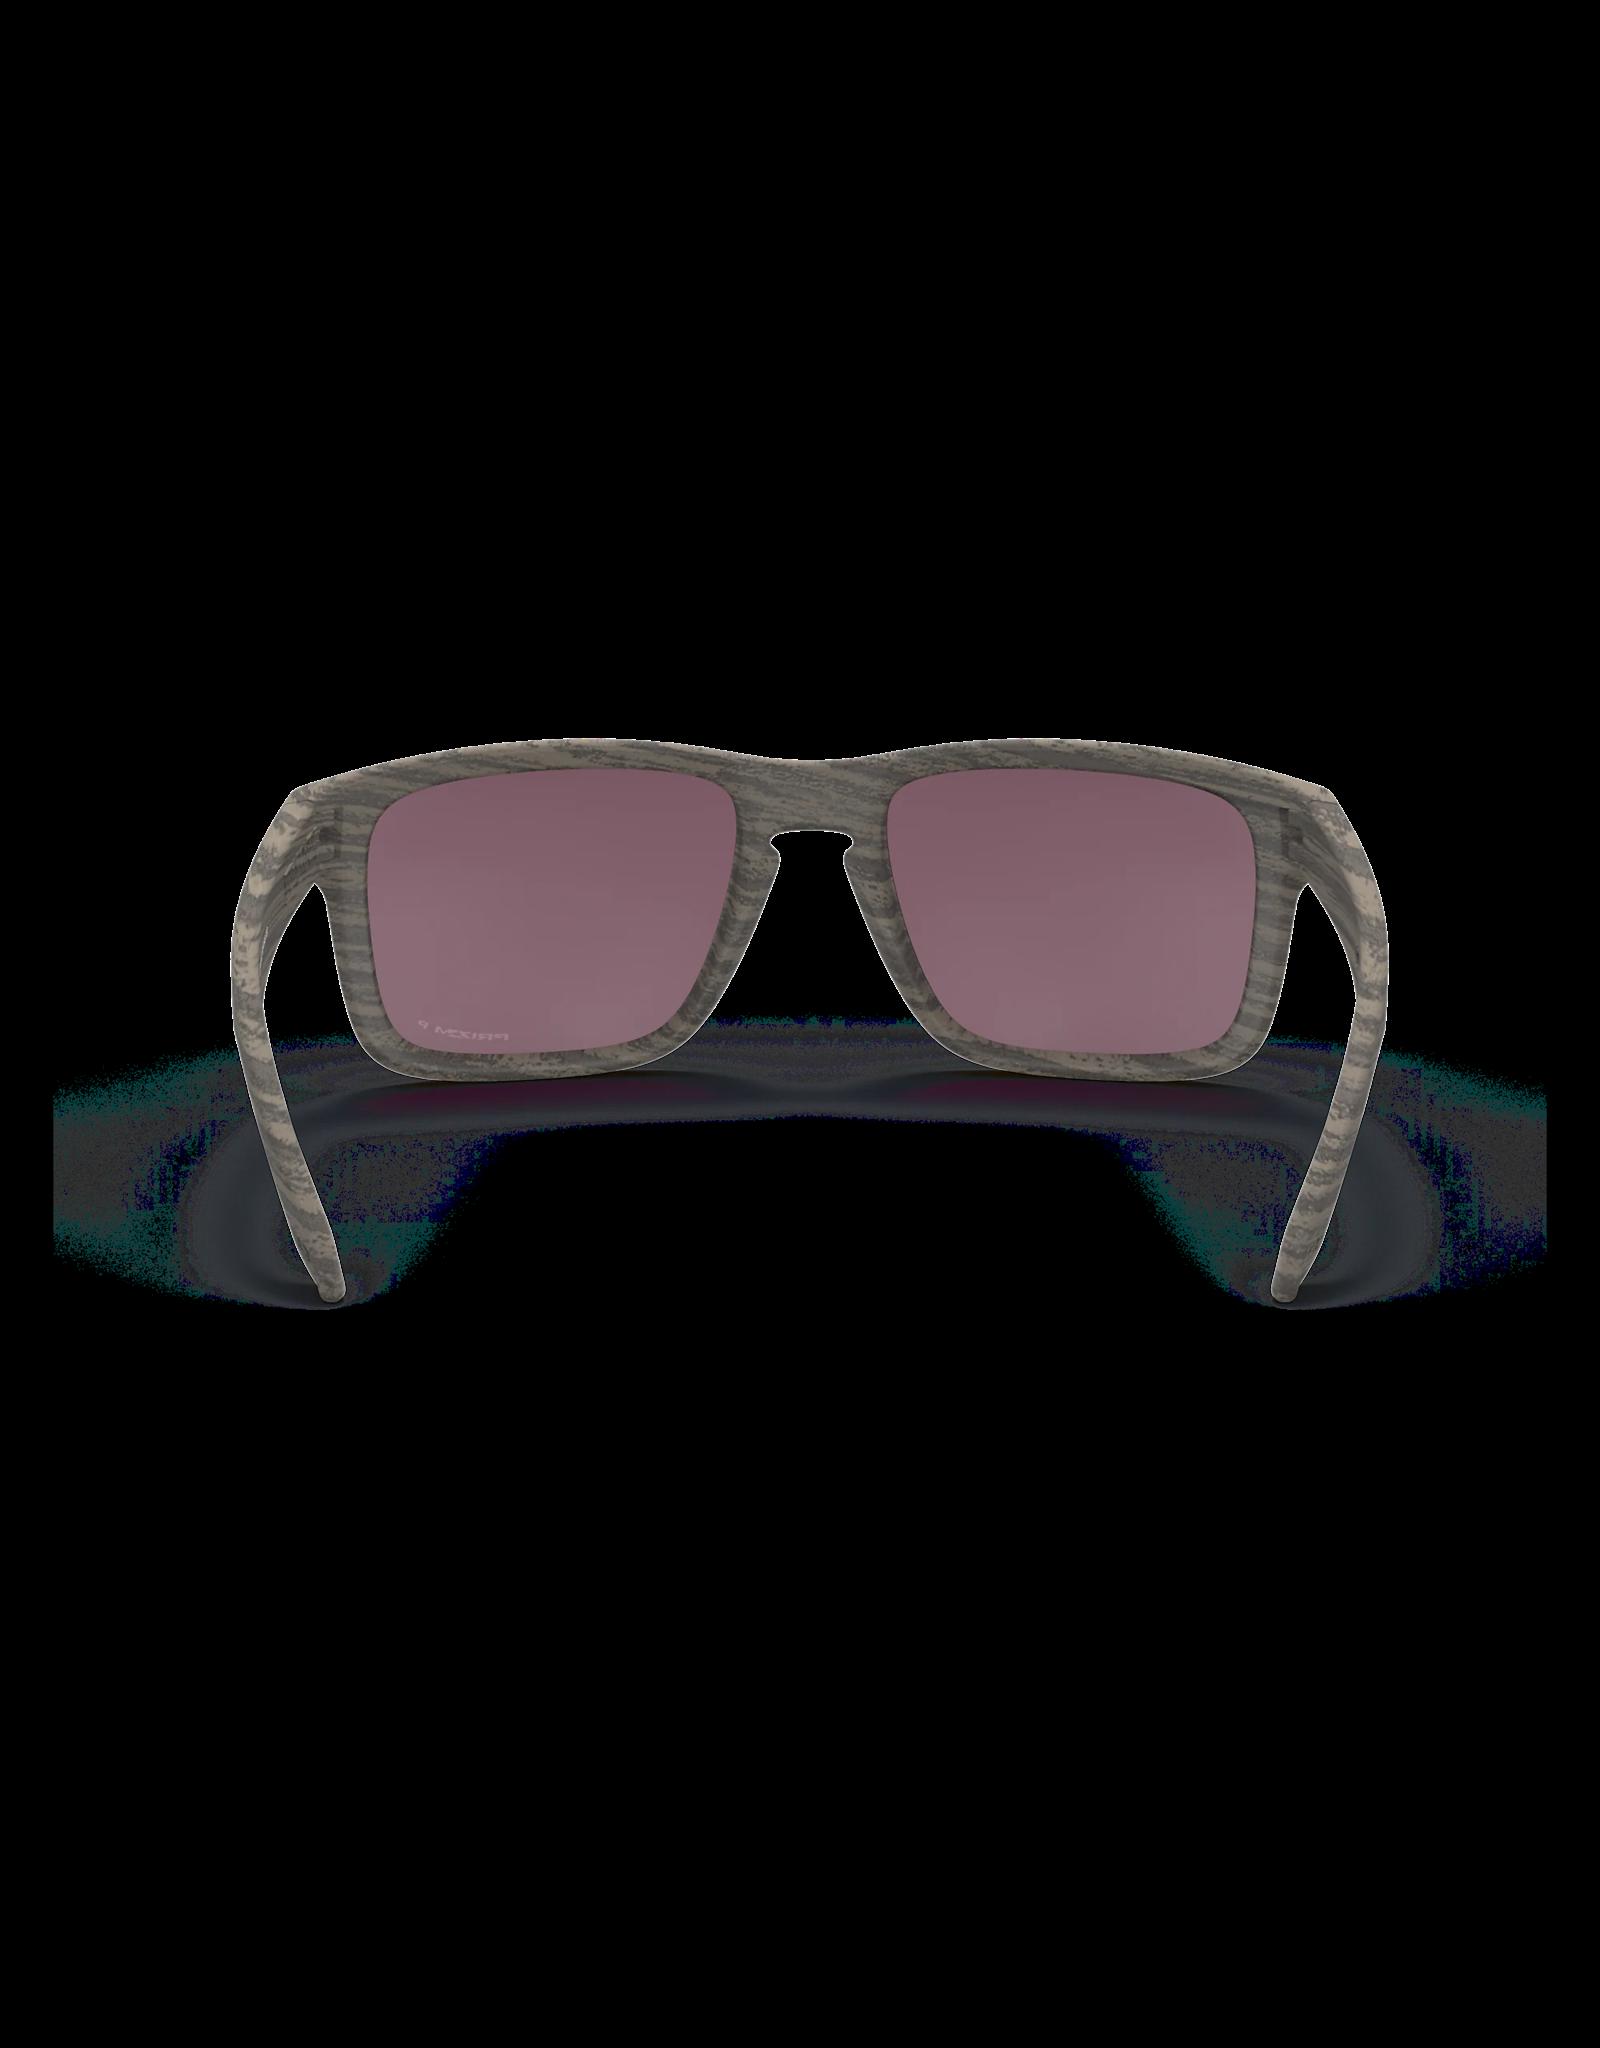 OAKLEY Oakley Holbrook Woodgrain w prizm daily polarized sun glasses